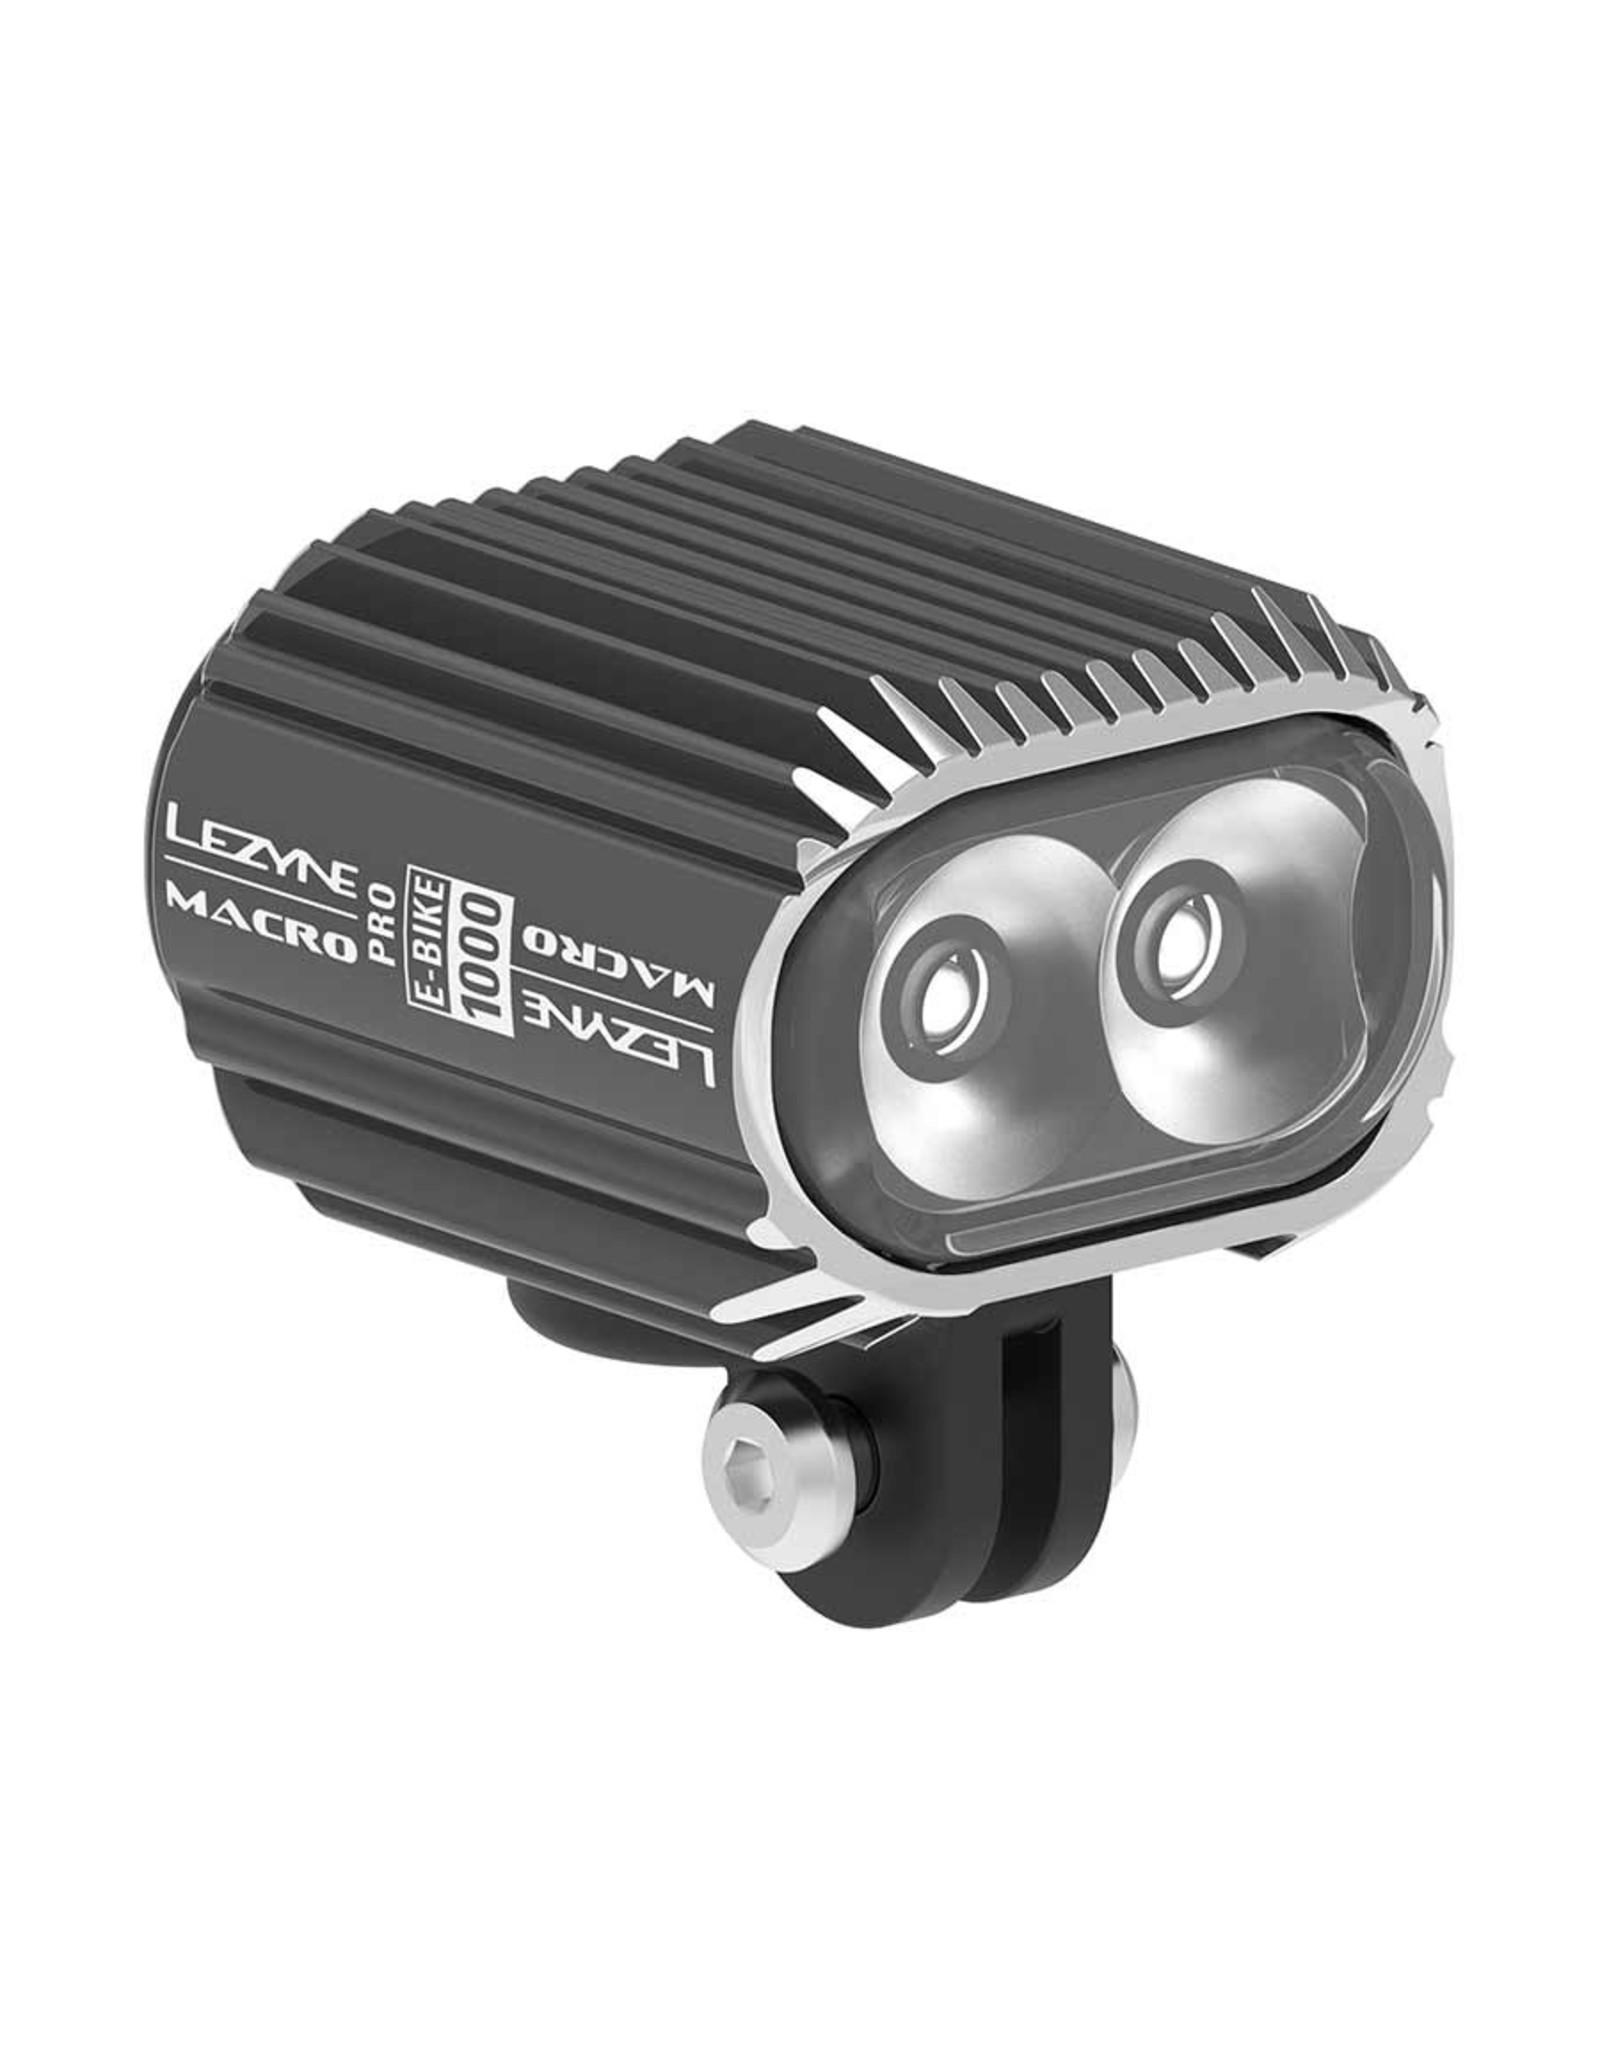 Lezyne Lezyne, E-Bike Macro Drive 1000, Light, Front, Black